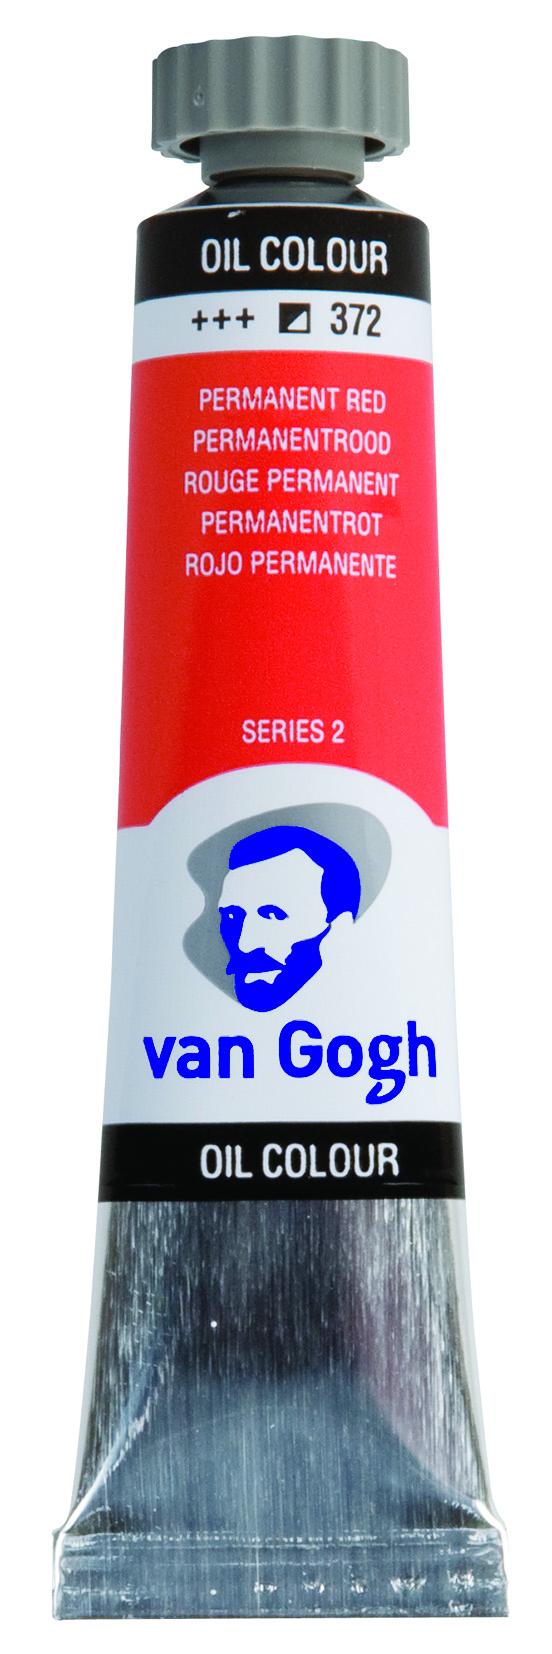 VAN GOGH OIL COLOUR TUBE 20 ML SERI 2